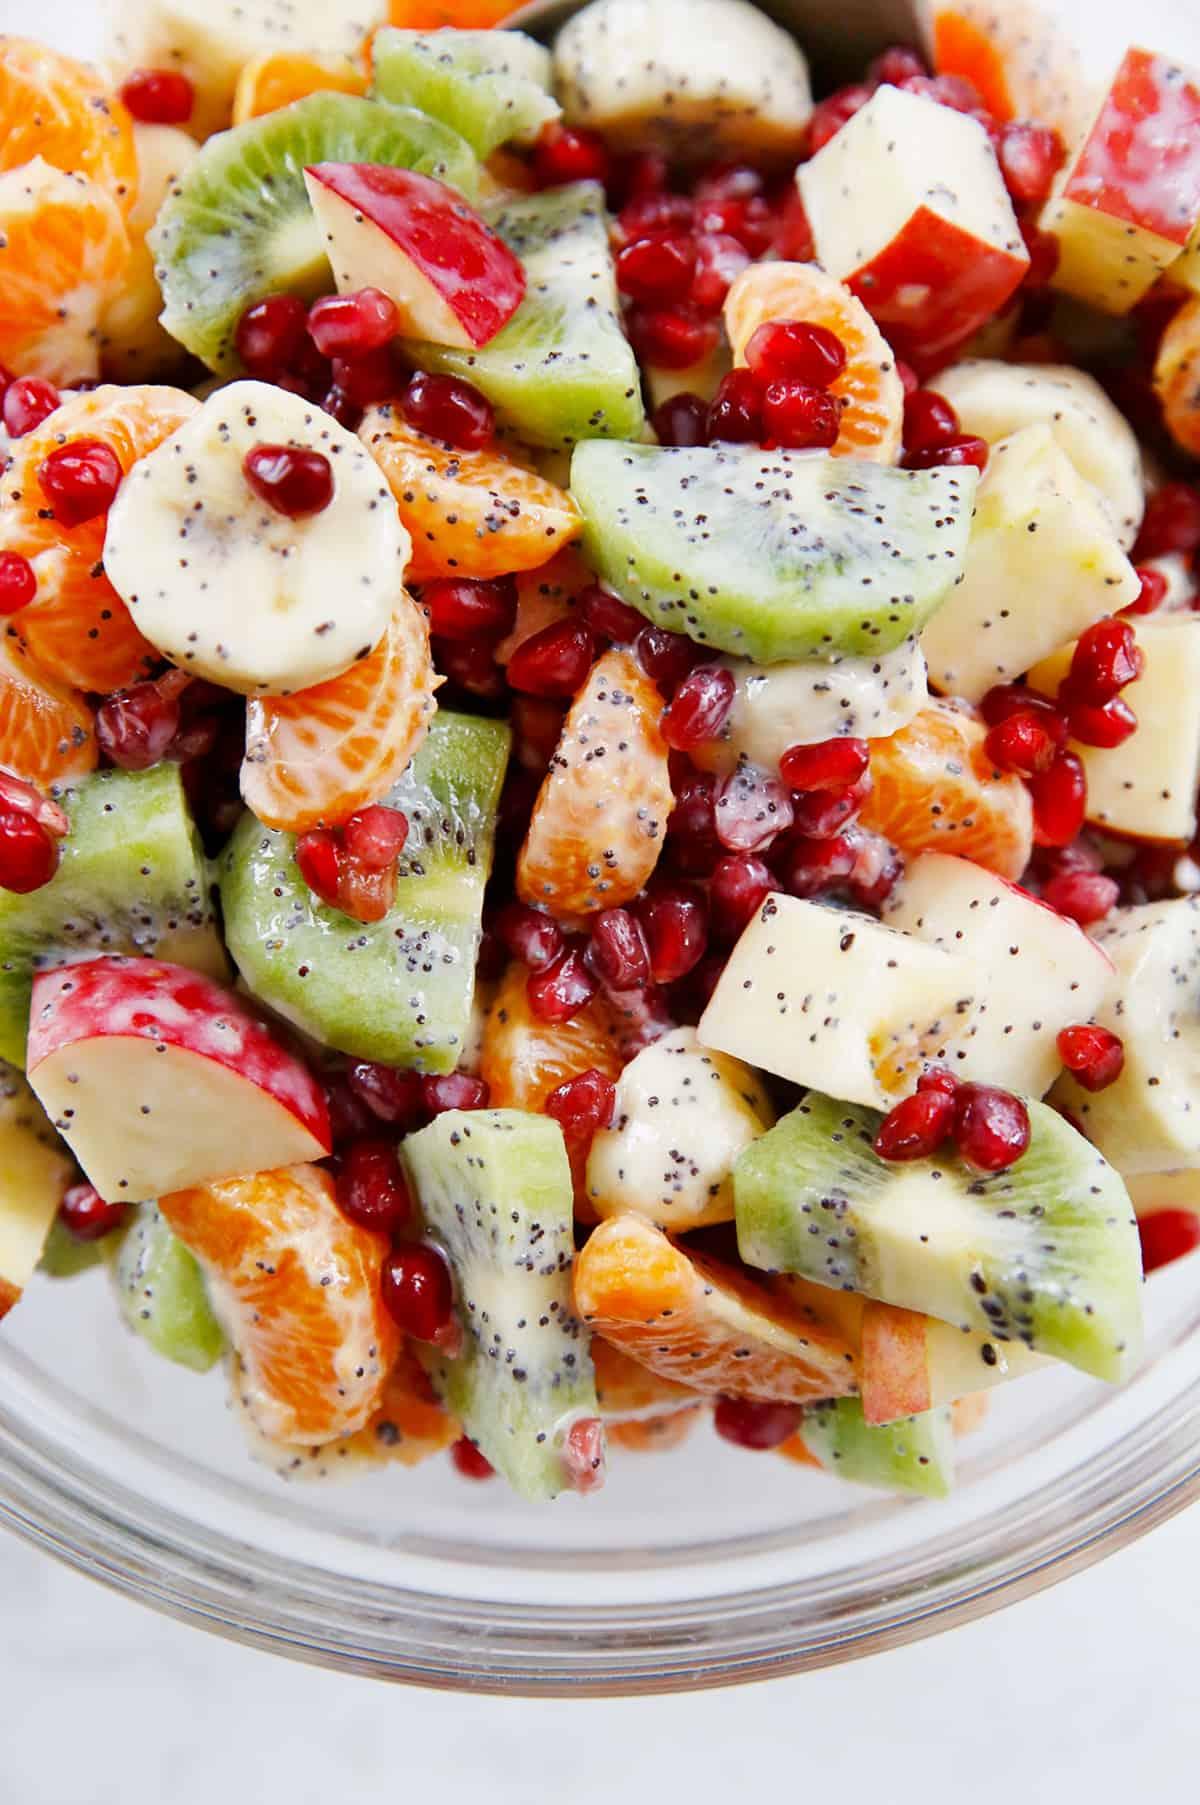 The Best Winter Fruit Salad